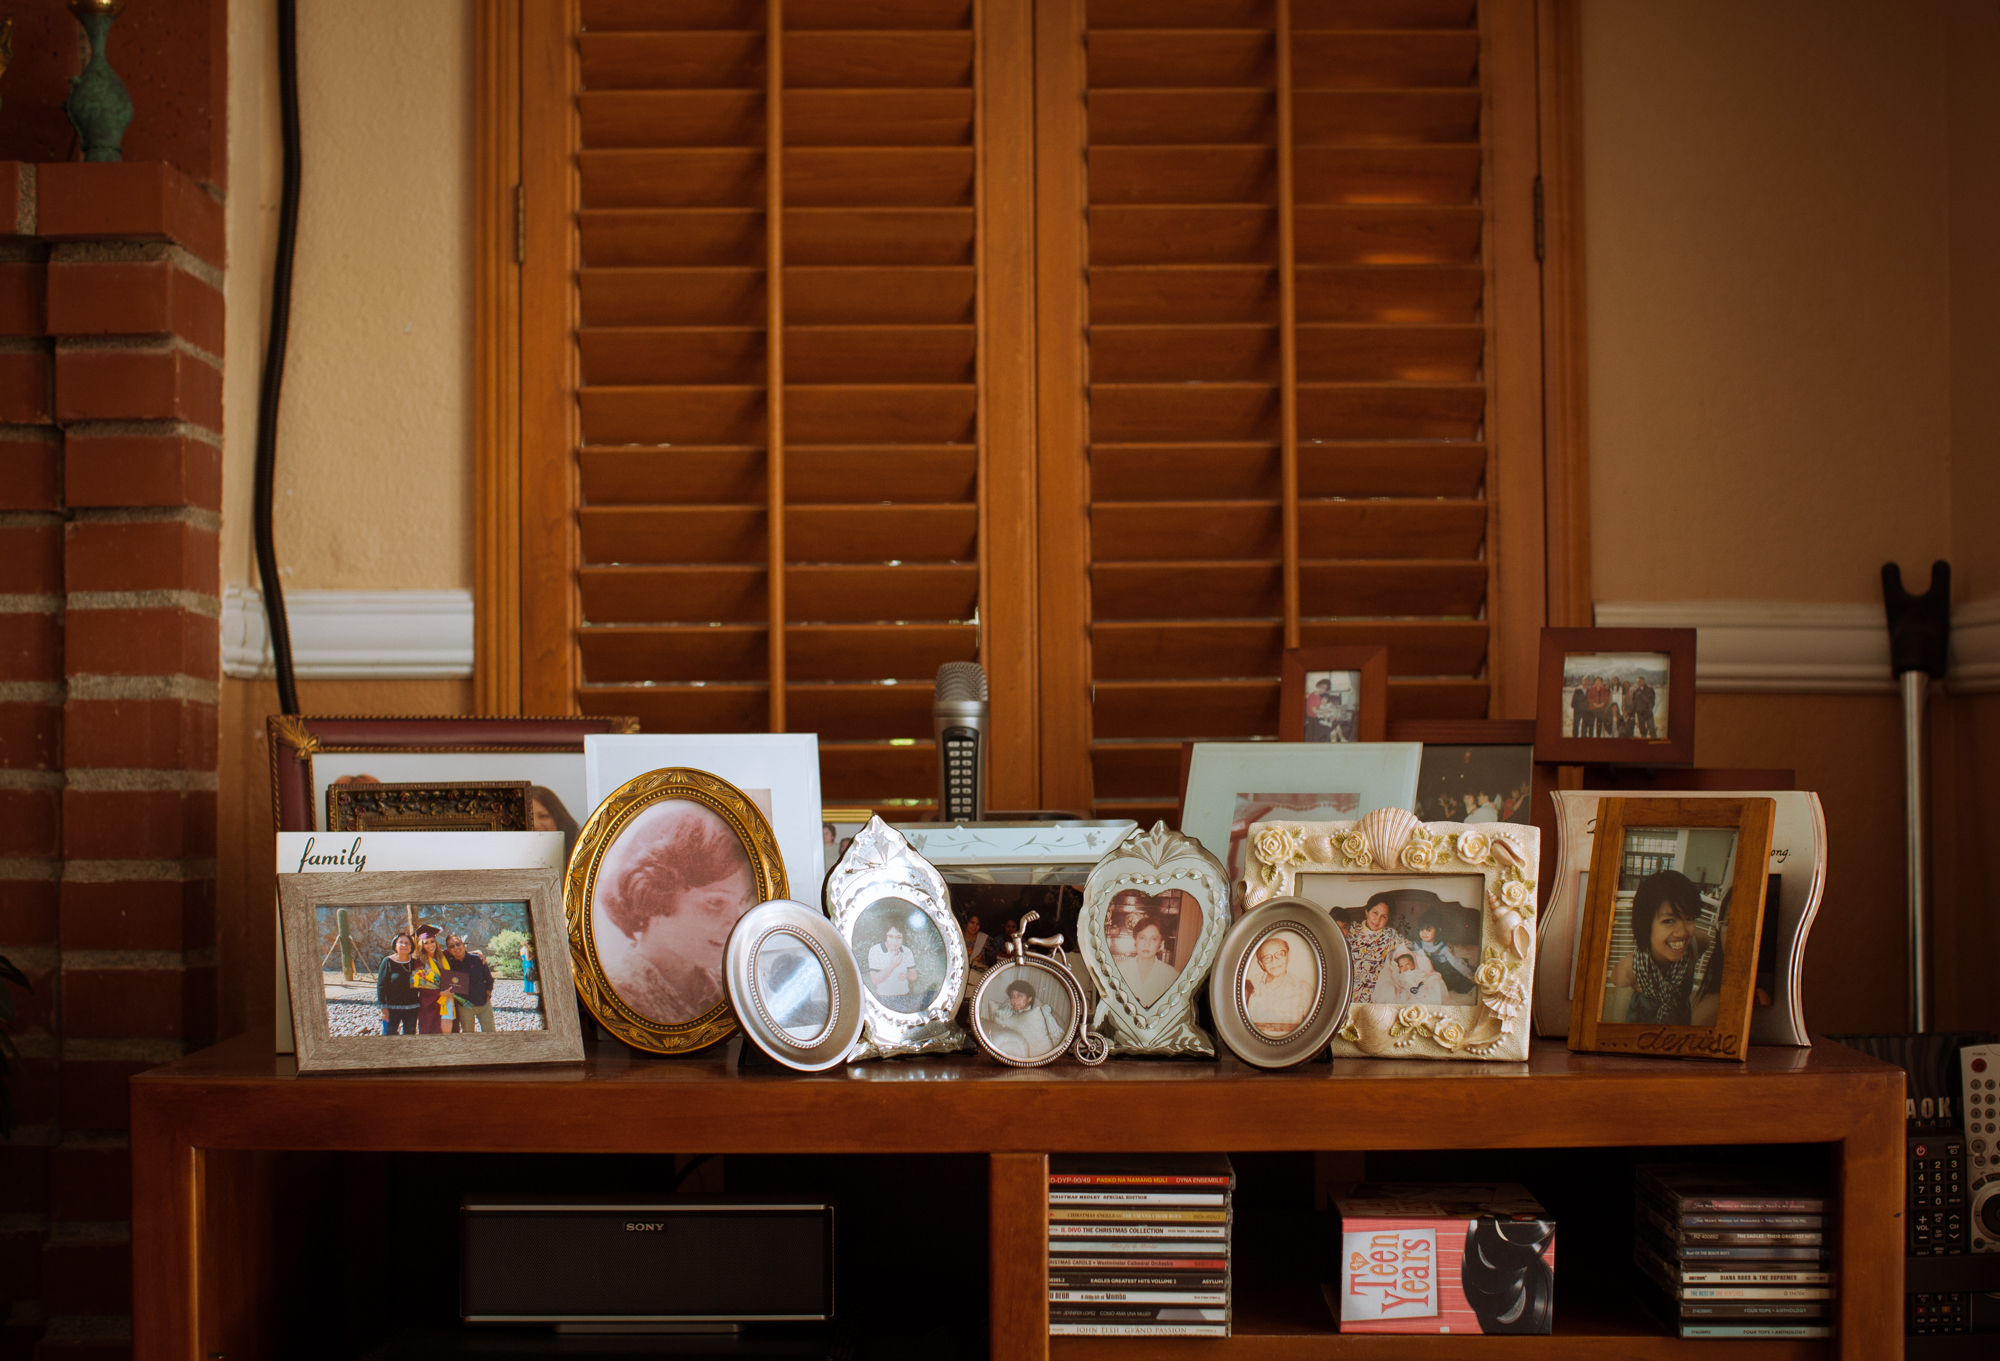 Family photos at the home of Manolo Guerra in Moreno Valley, California, Wednesday, Aug. 7, 2019. (Photo/ Kat Kaye)